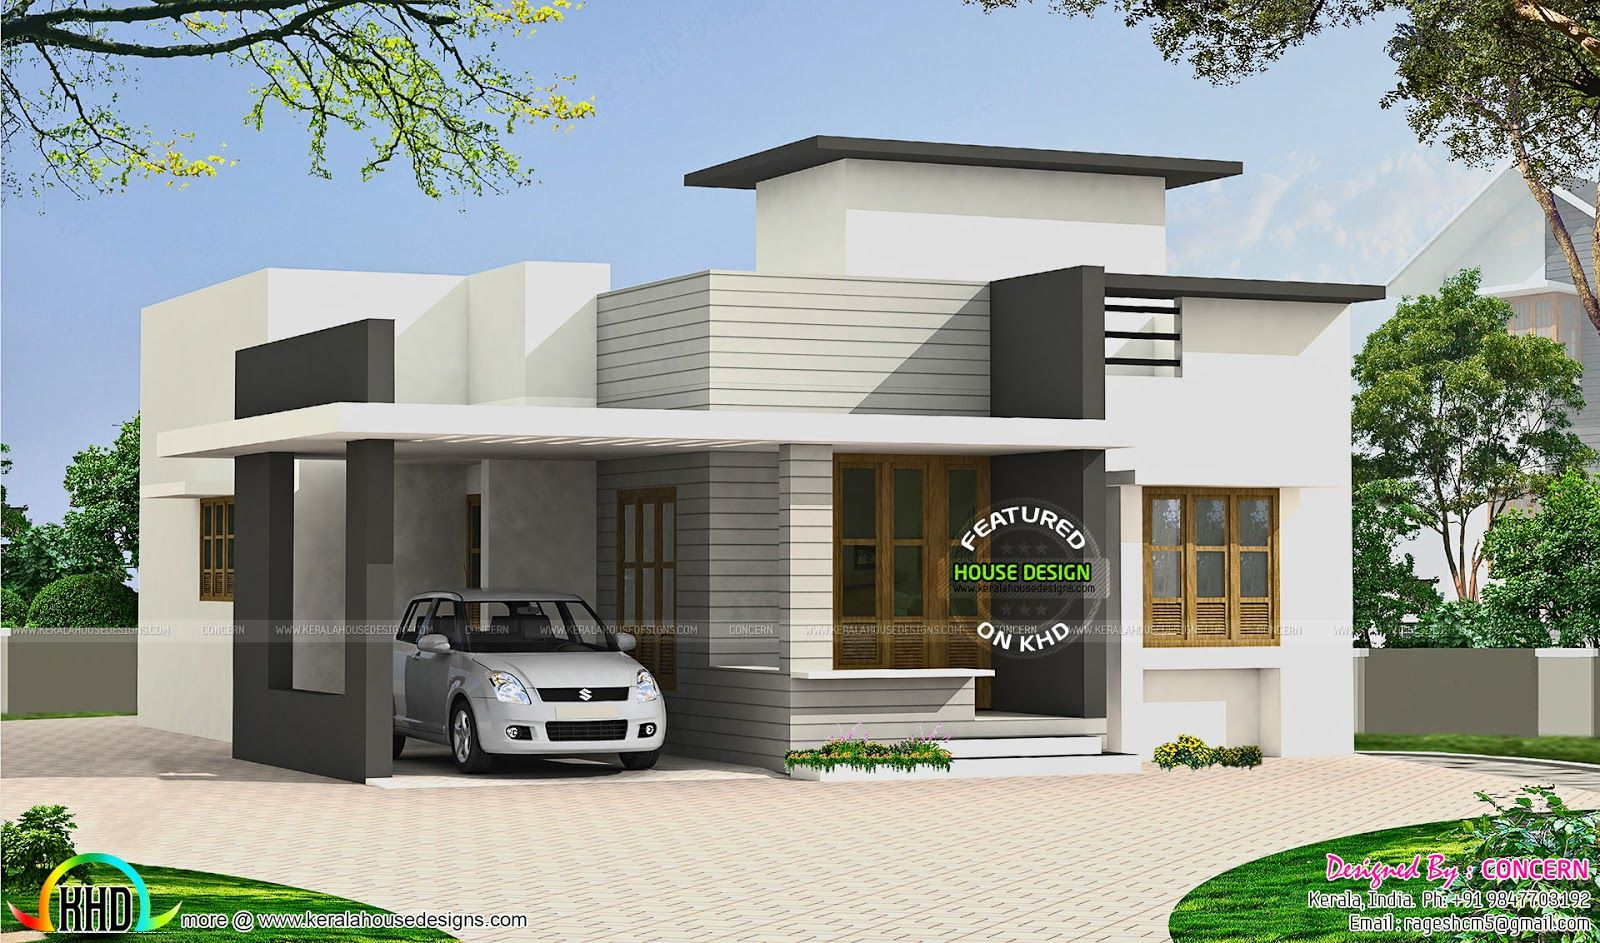 Image Result For Parking Roof Design In Single Floor